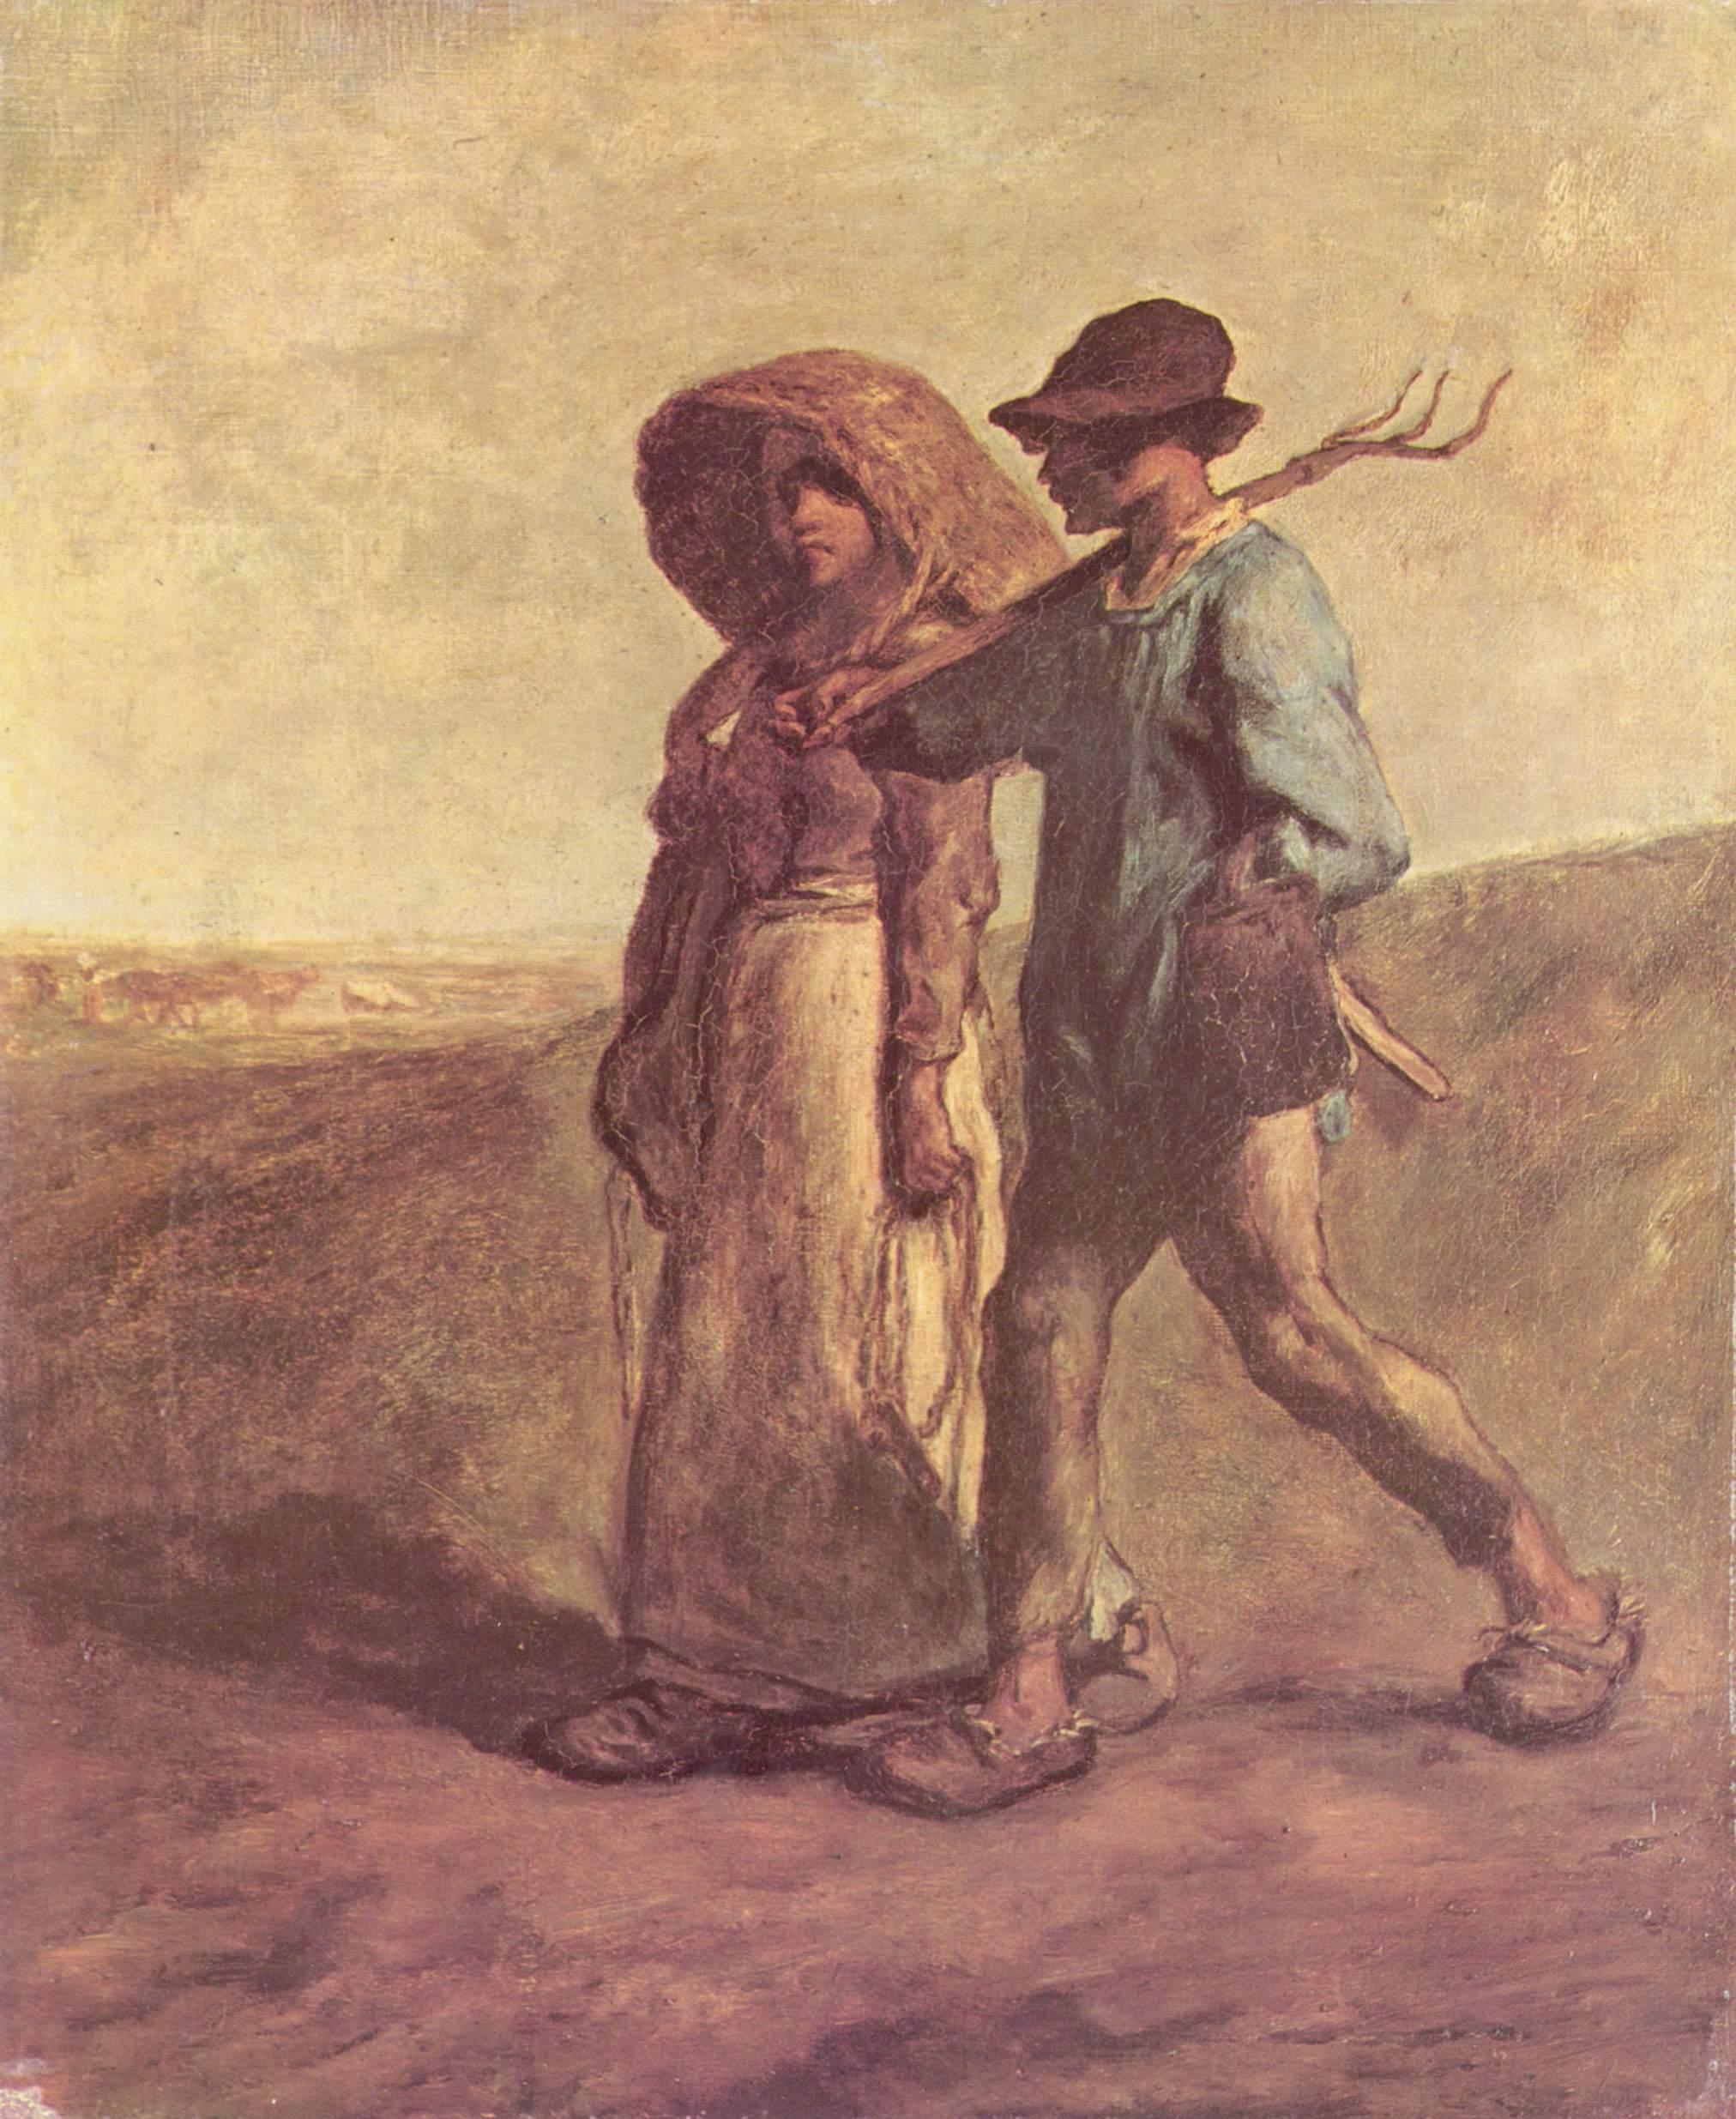 Los comedores de patatas, 1885 - Vincent van Gogh - WikiArt.org